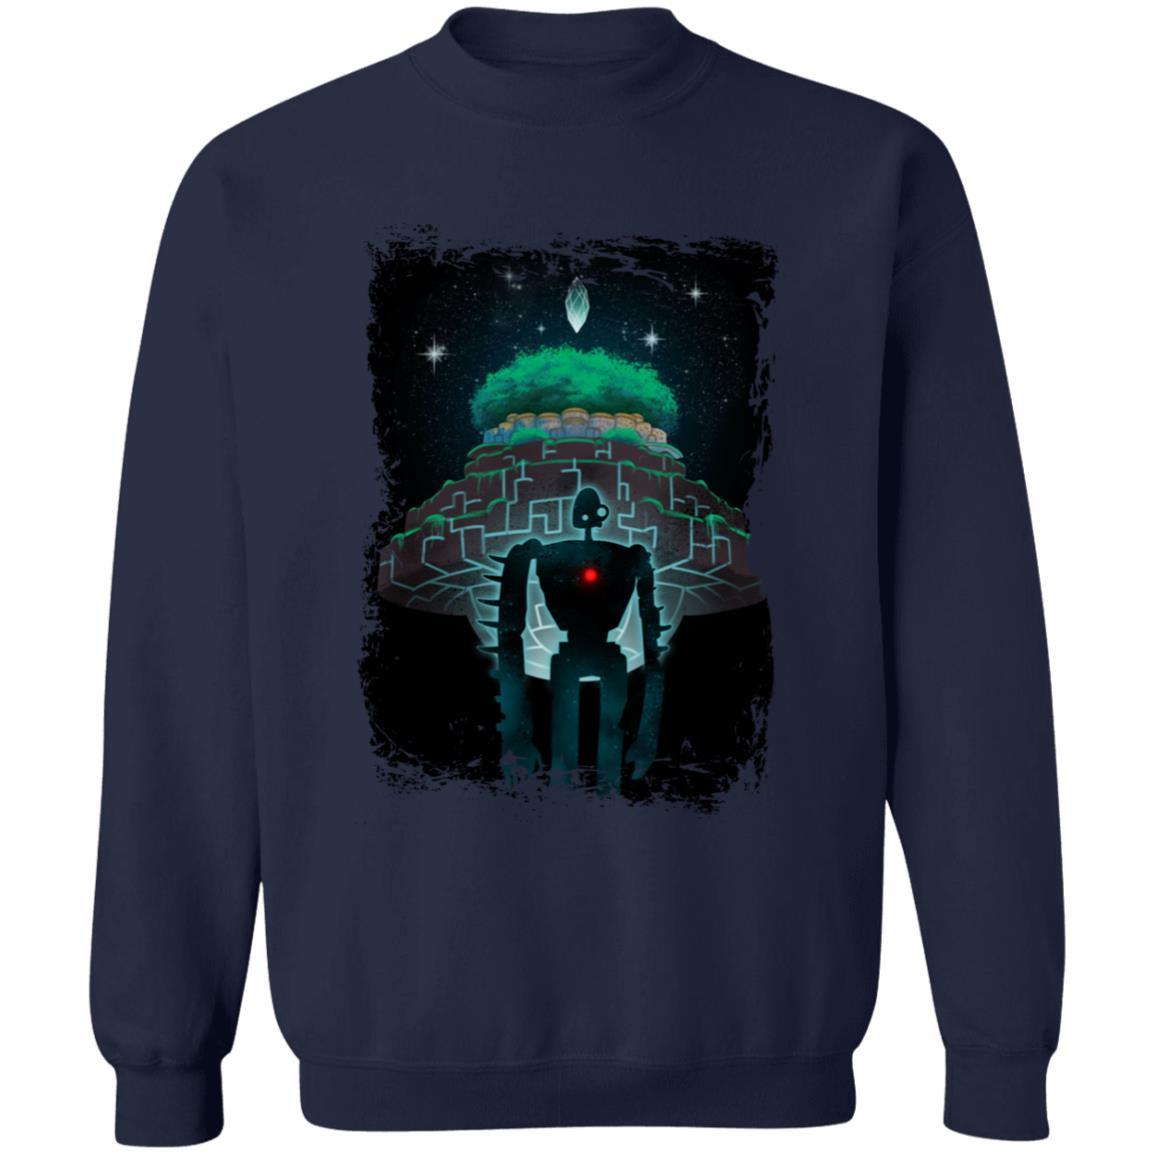 Laputa: Castle in The Sky Nigh Time Sweatshirt